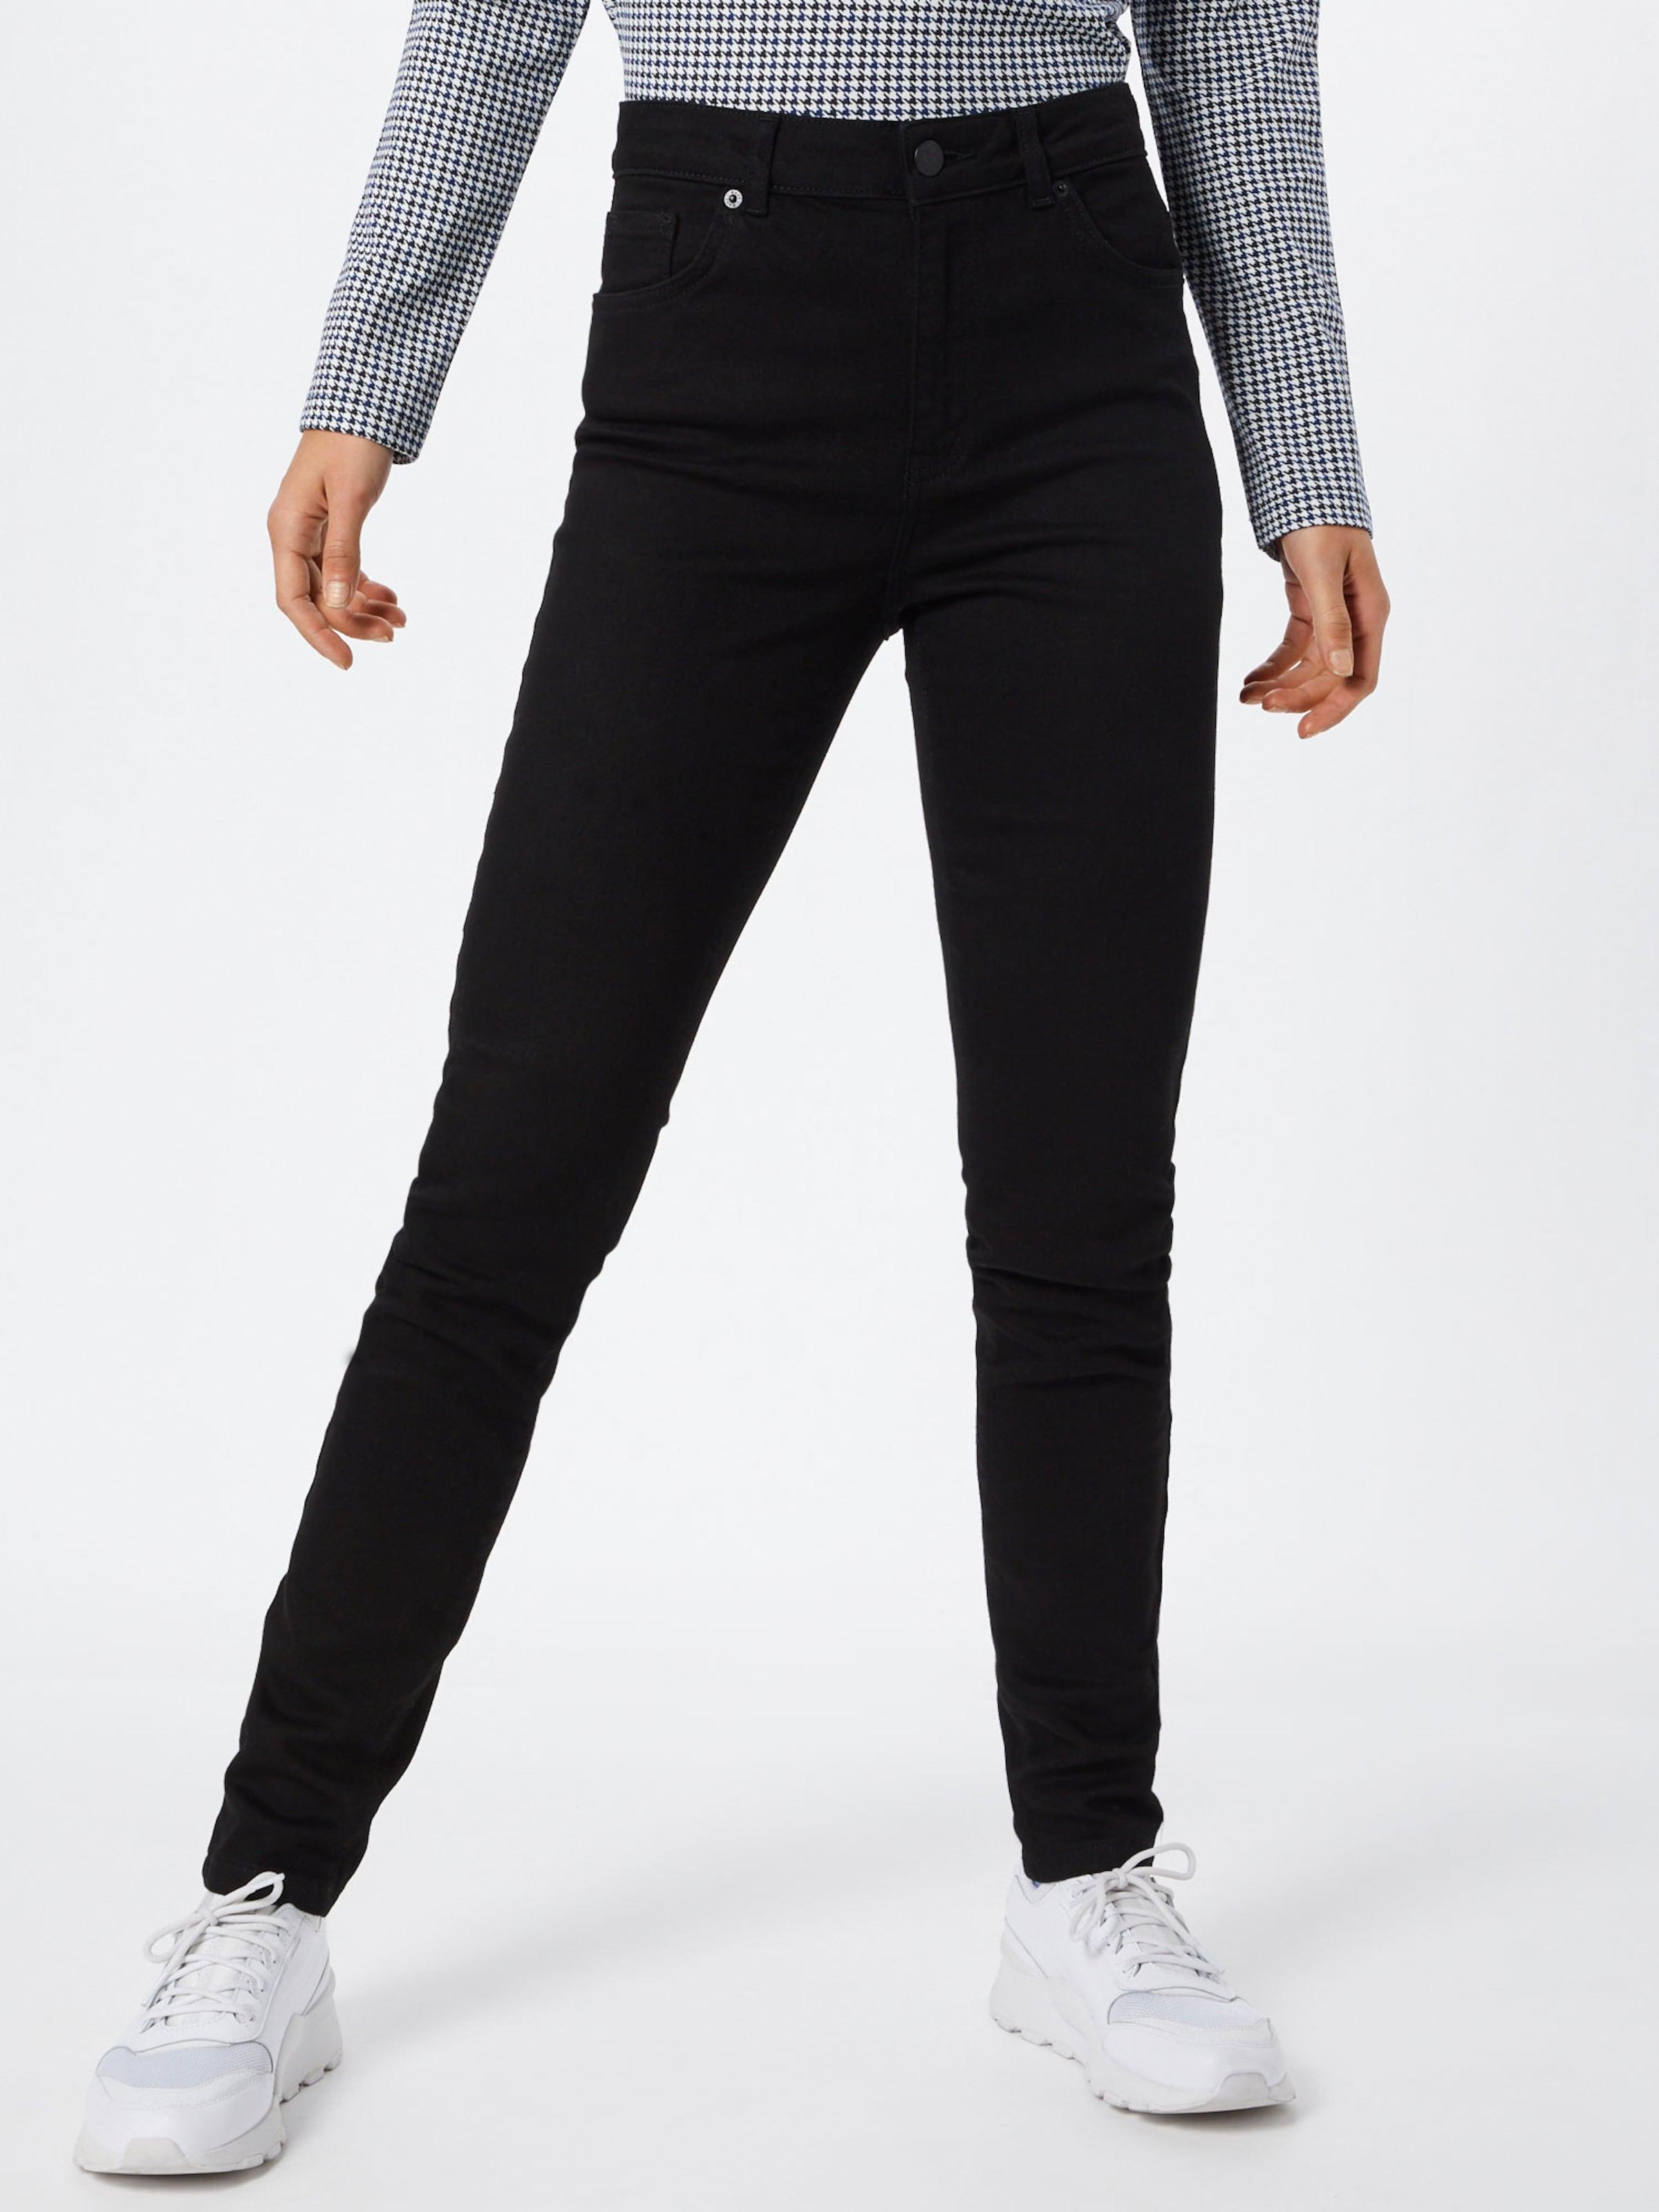 In Denim Jeans 'stella' Black Why7 K3F1cJu5lT